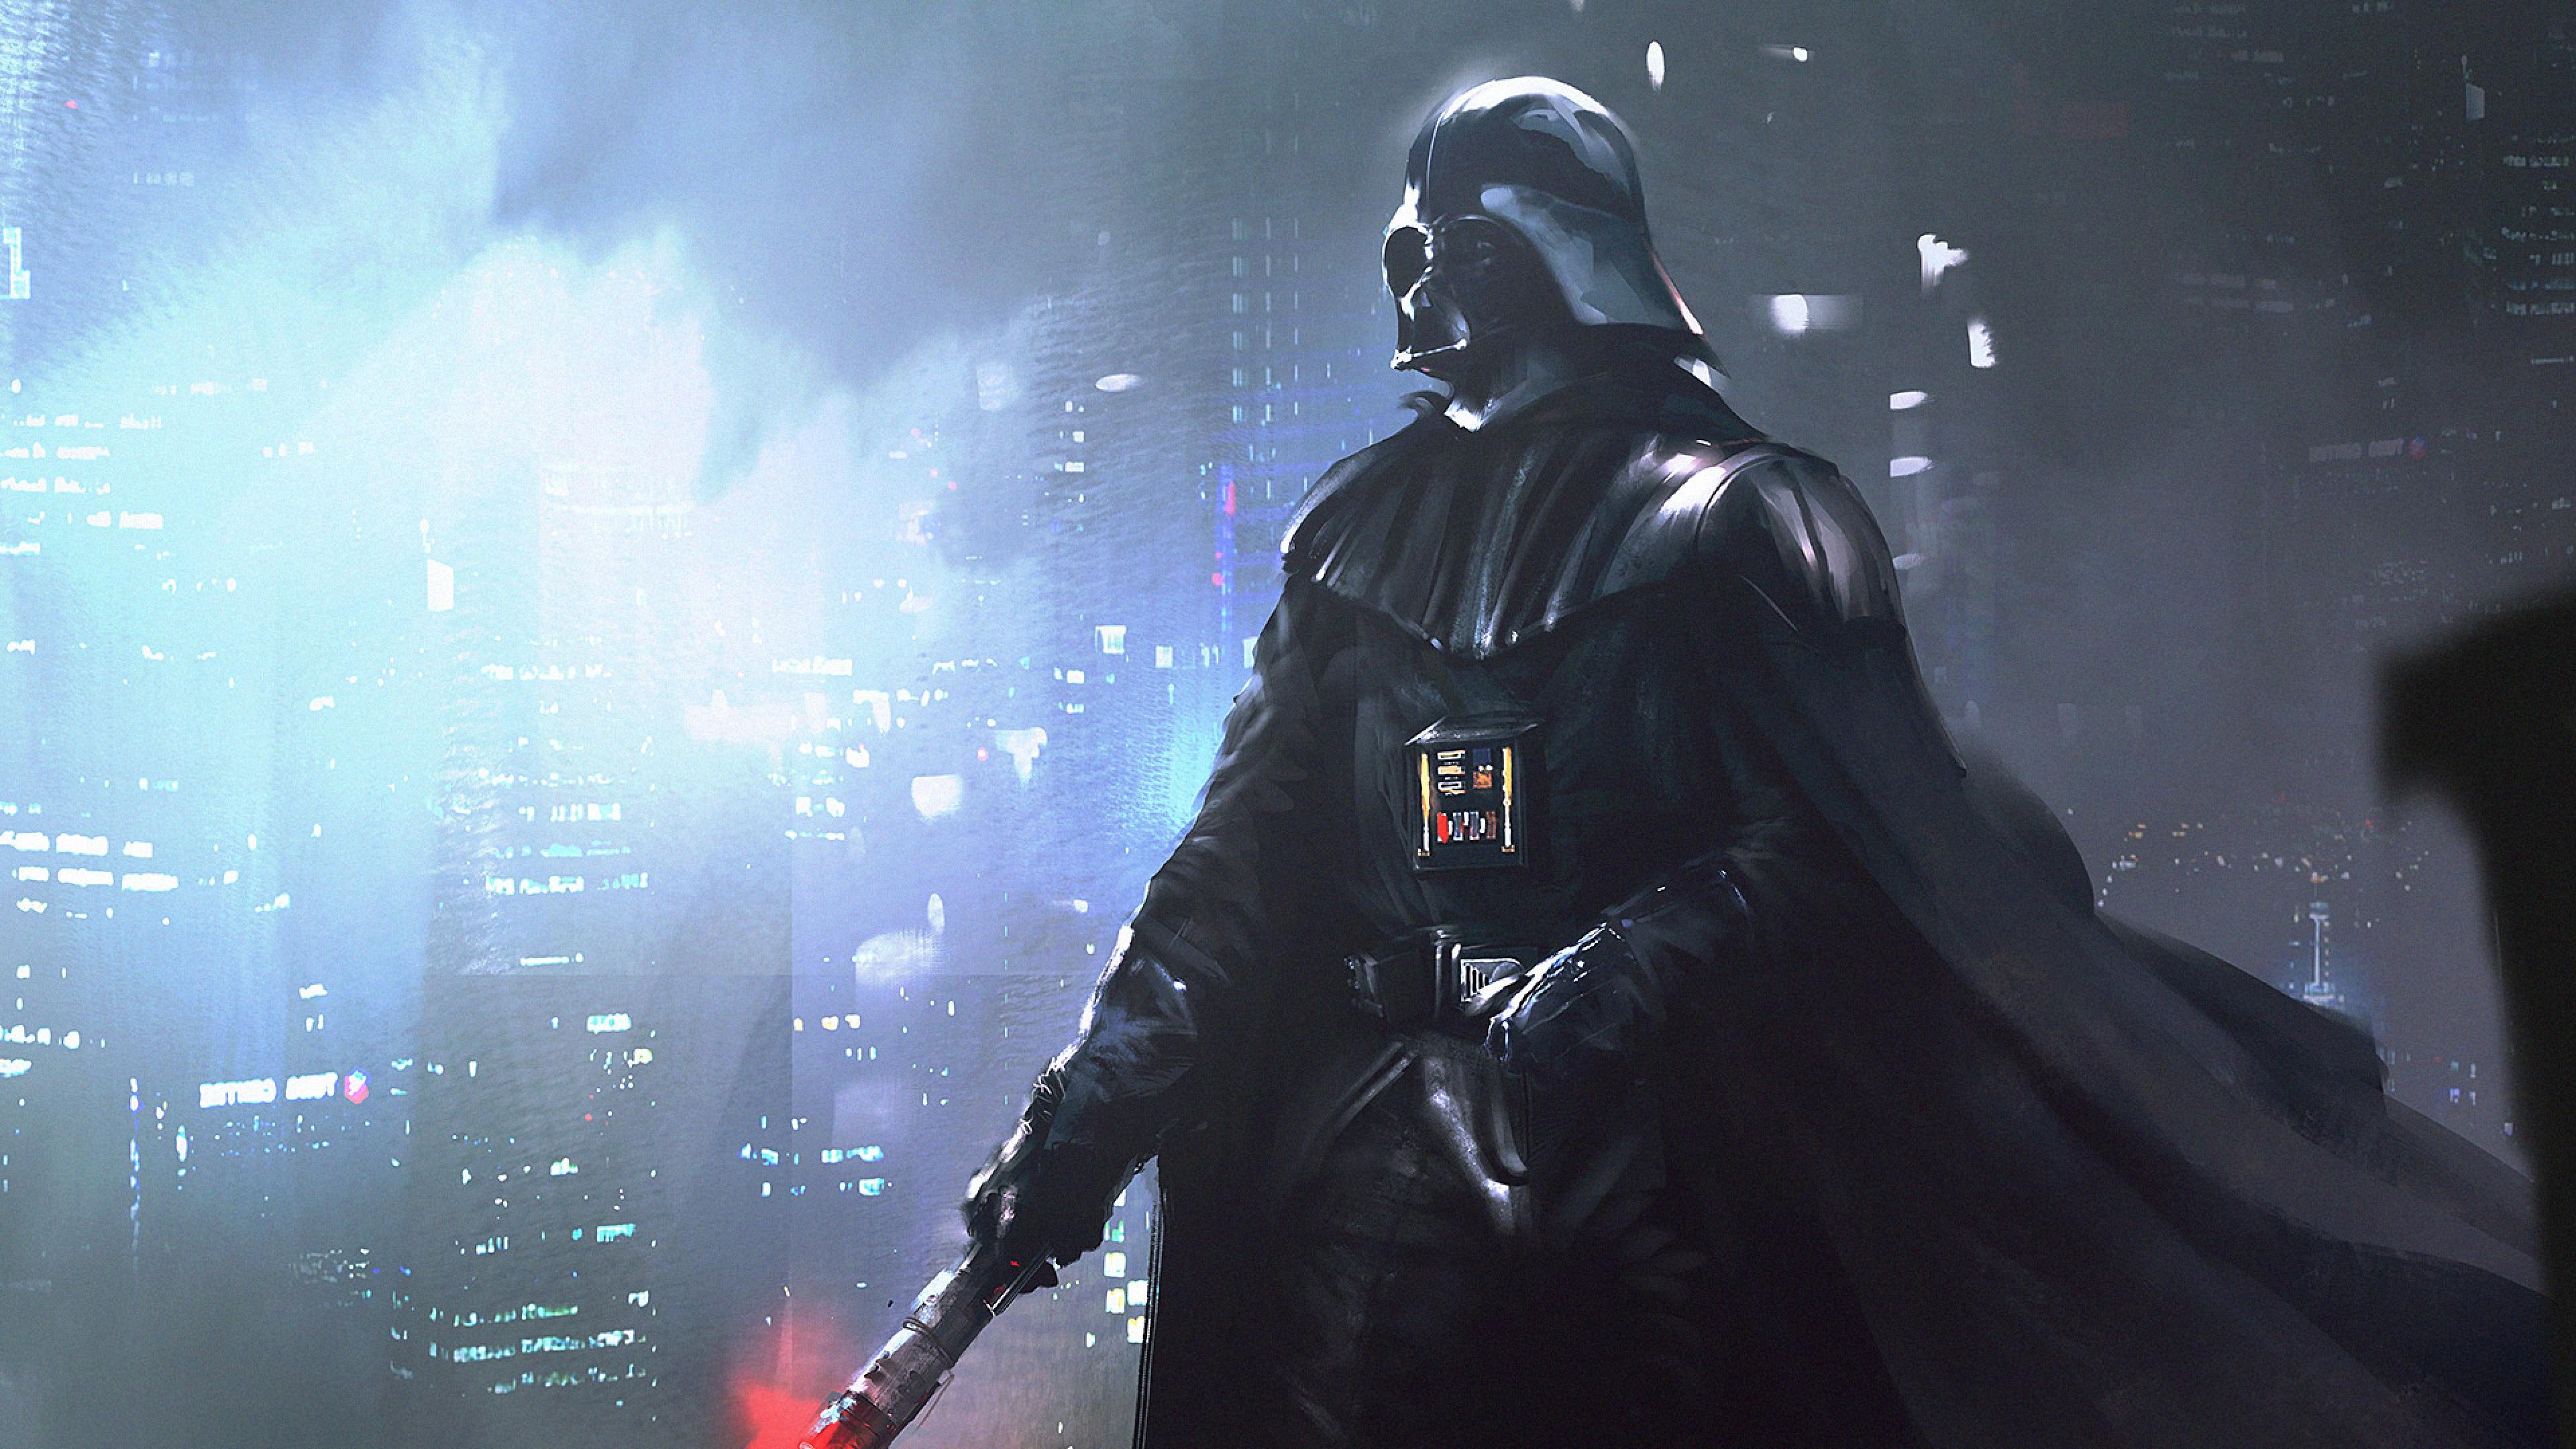 Free Download Star Wars Darth Vader Anakin Skywalker 4k Ultra Hd Hd Background 3840x2160 For Your Desktop Mobile Tablet Explore 39 Star War Wallpaper Ultra Hd Star Wars Hd